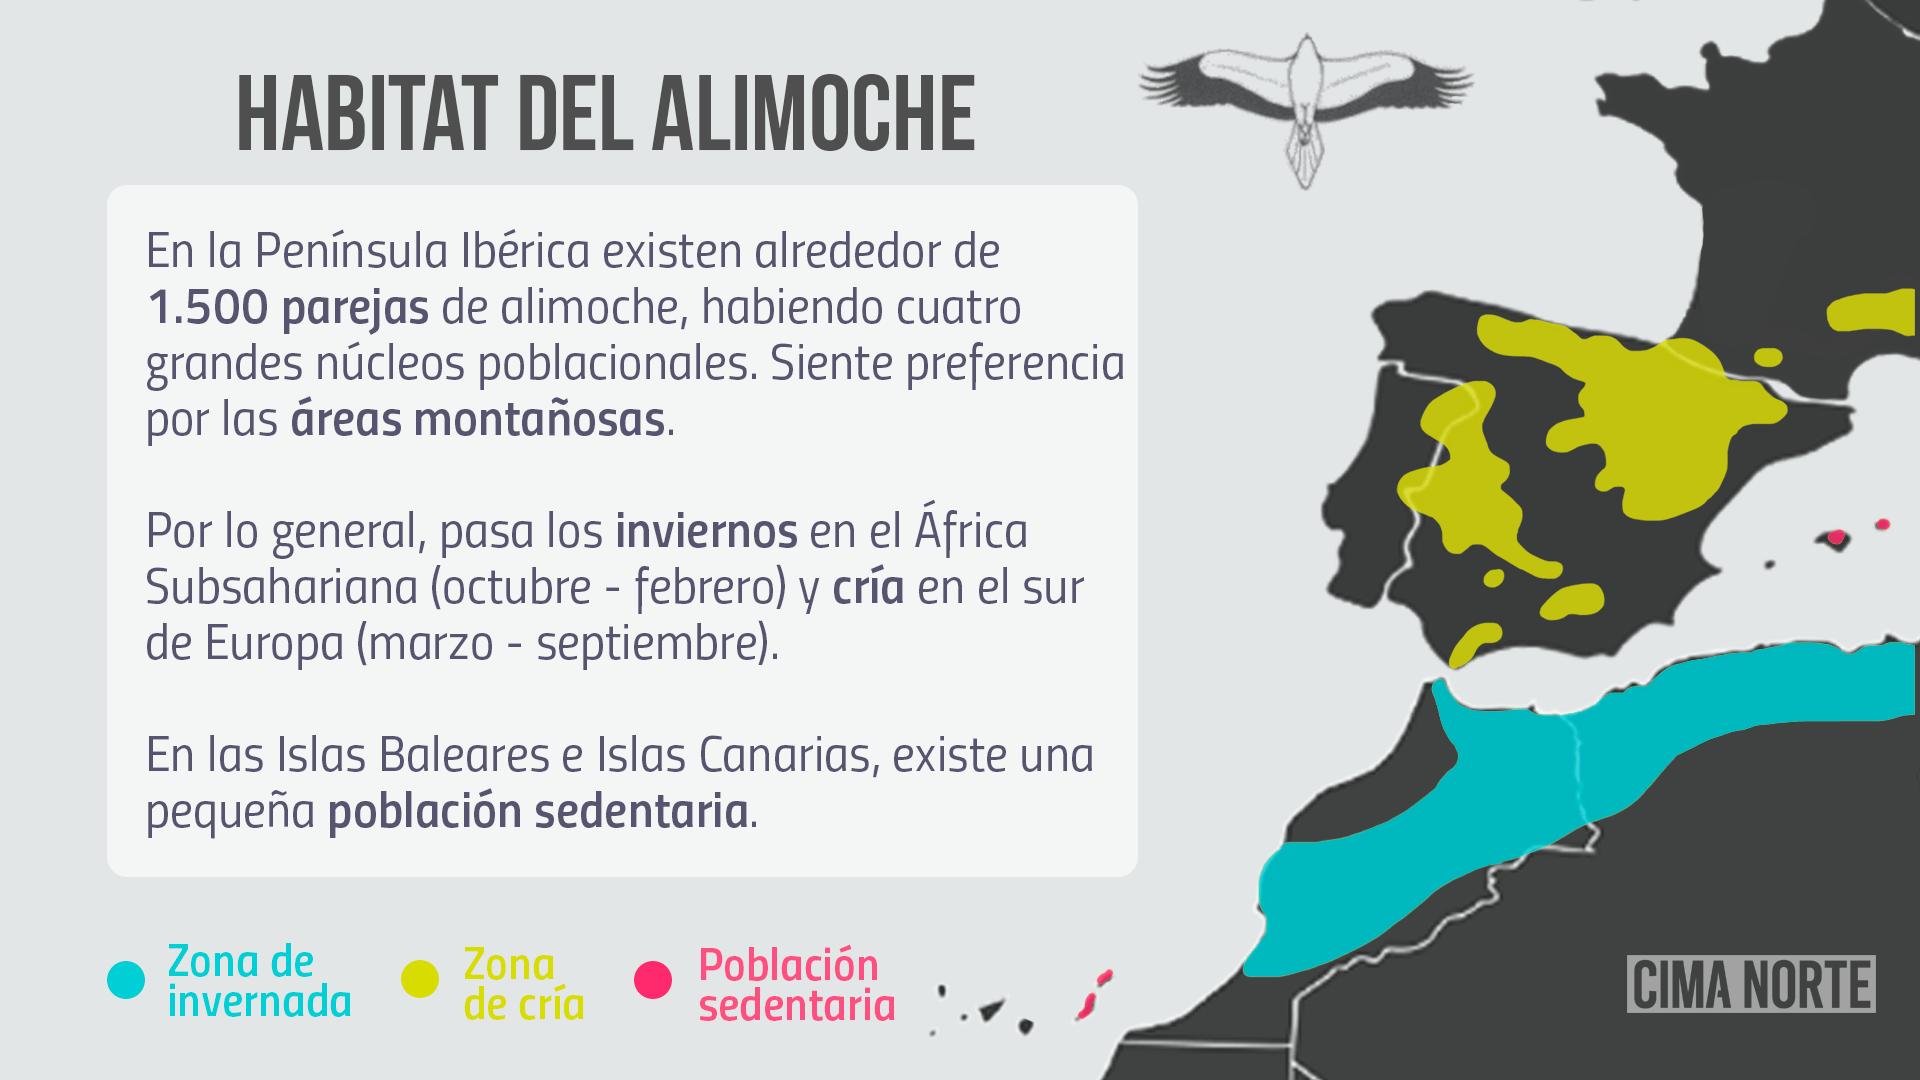 habitat alimoche mapa peninsula iberica pirineo cima norte